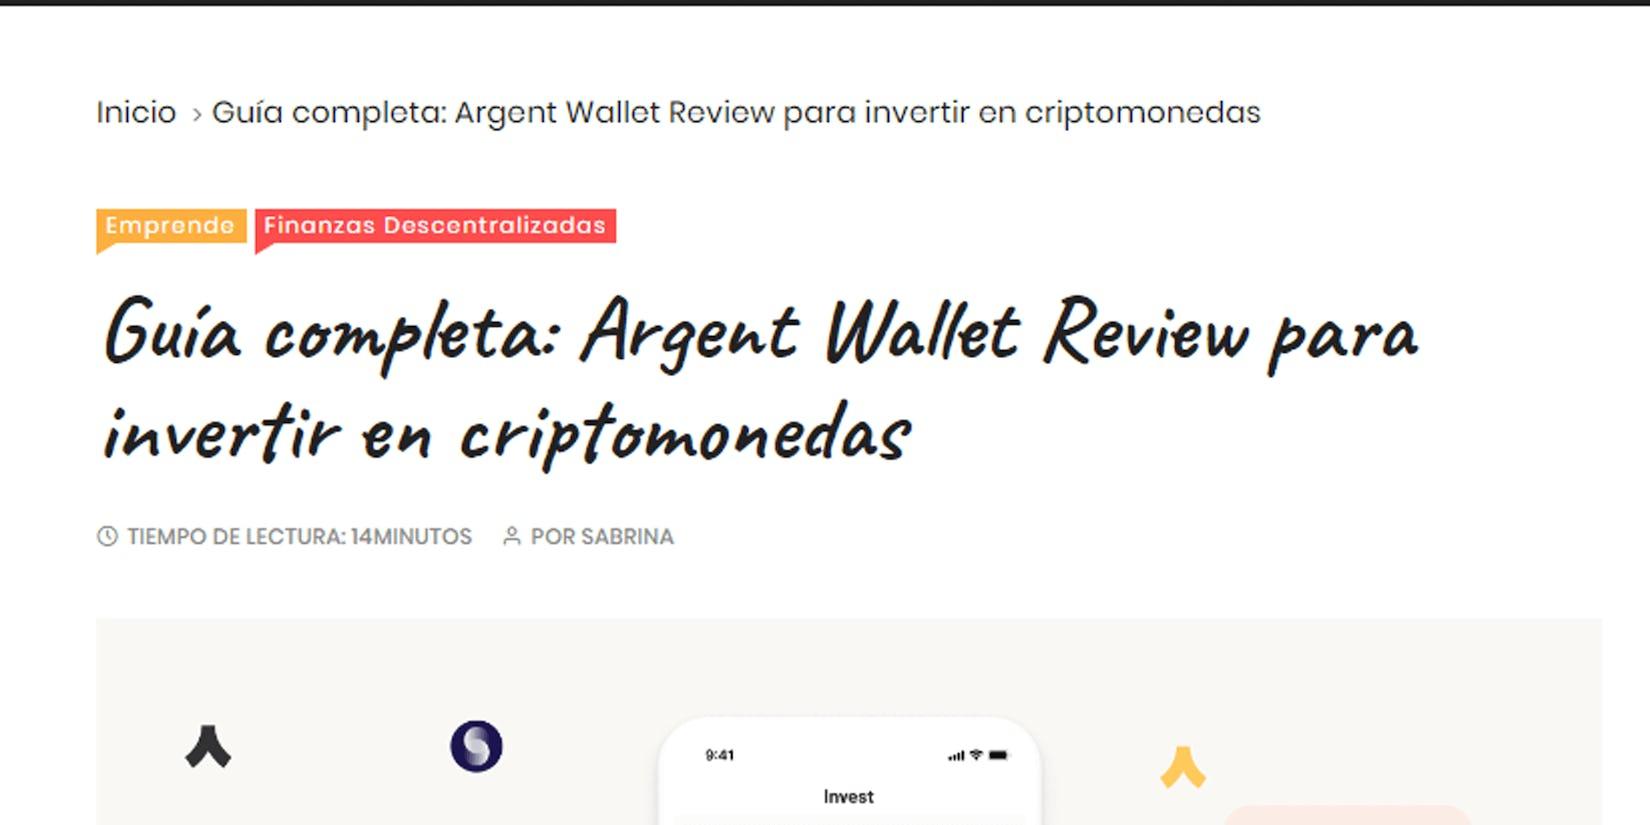 Guía completa - Argent Wallet Review para invertir en criptomonedas